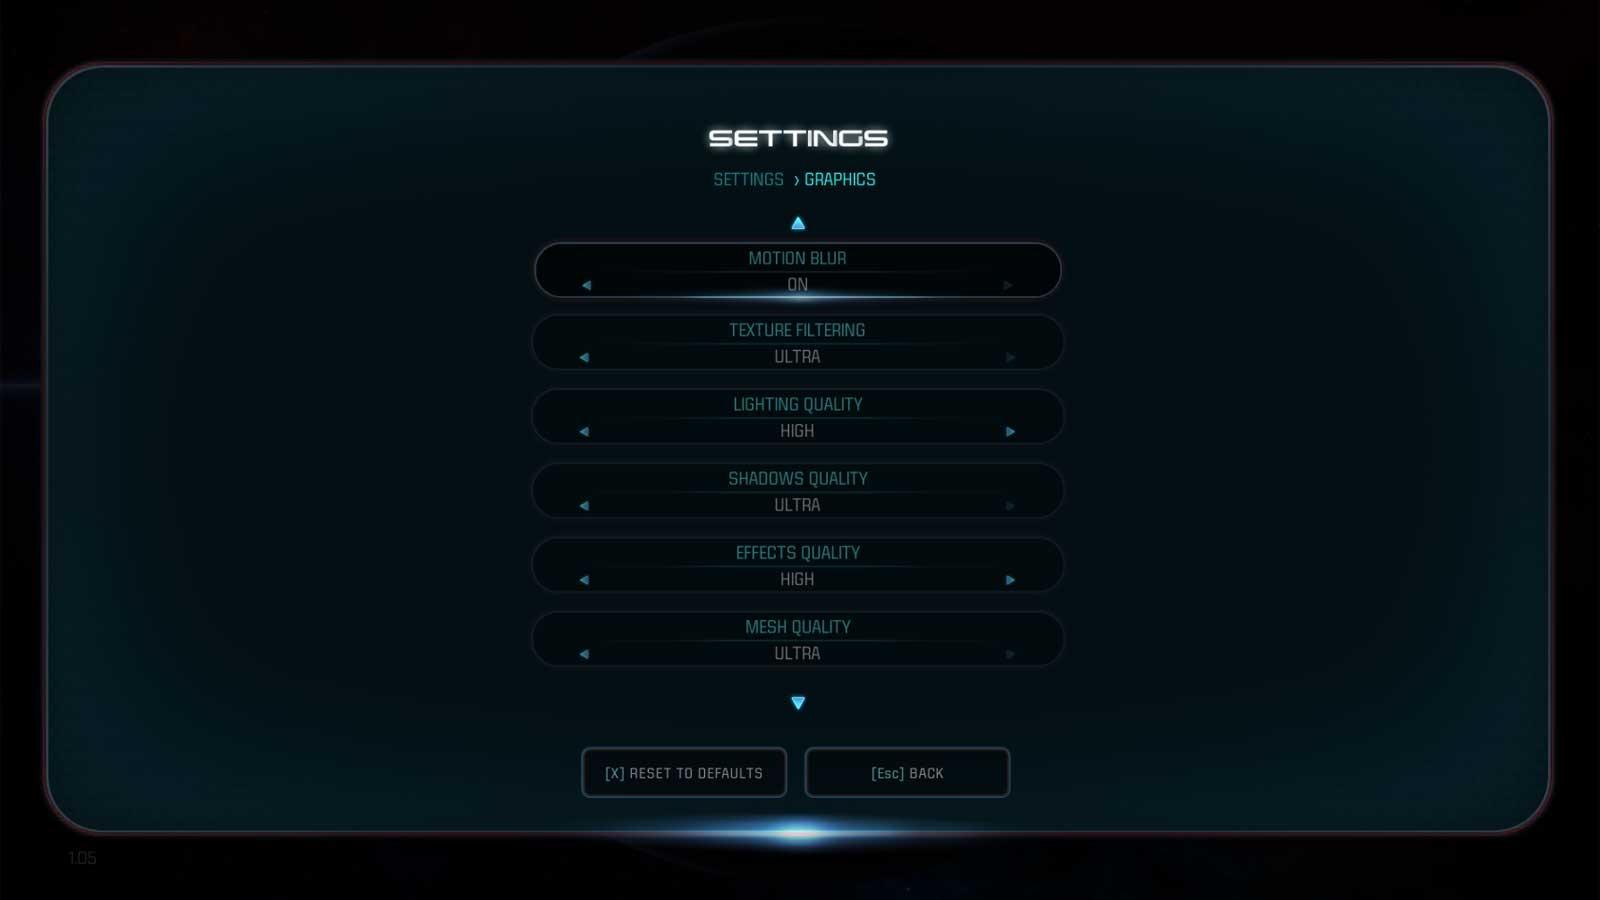 Mass Effect: Andromeda nastavení 4